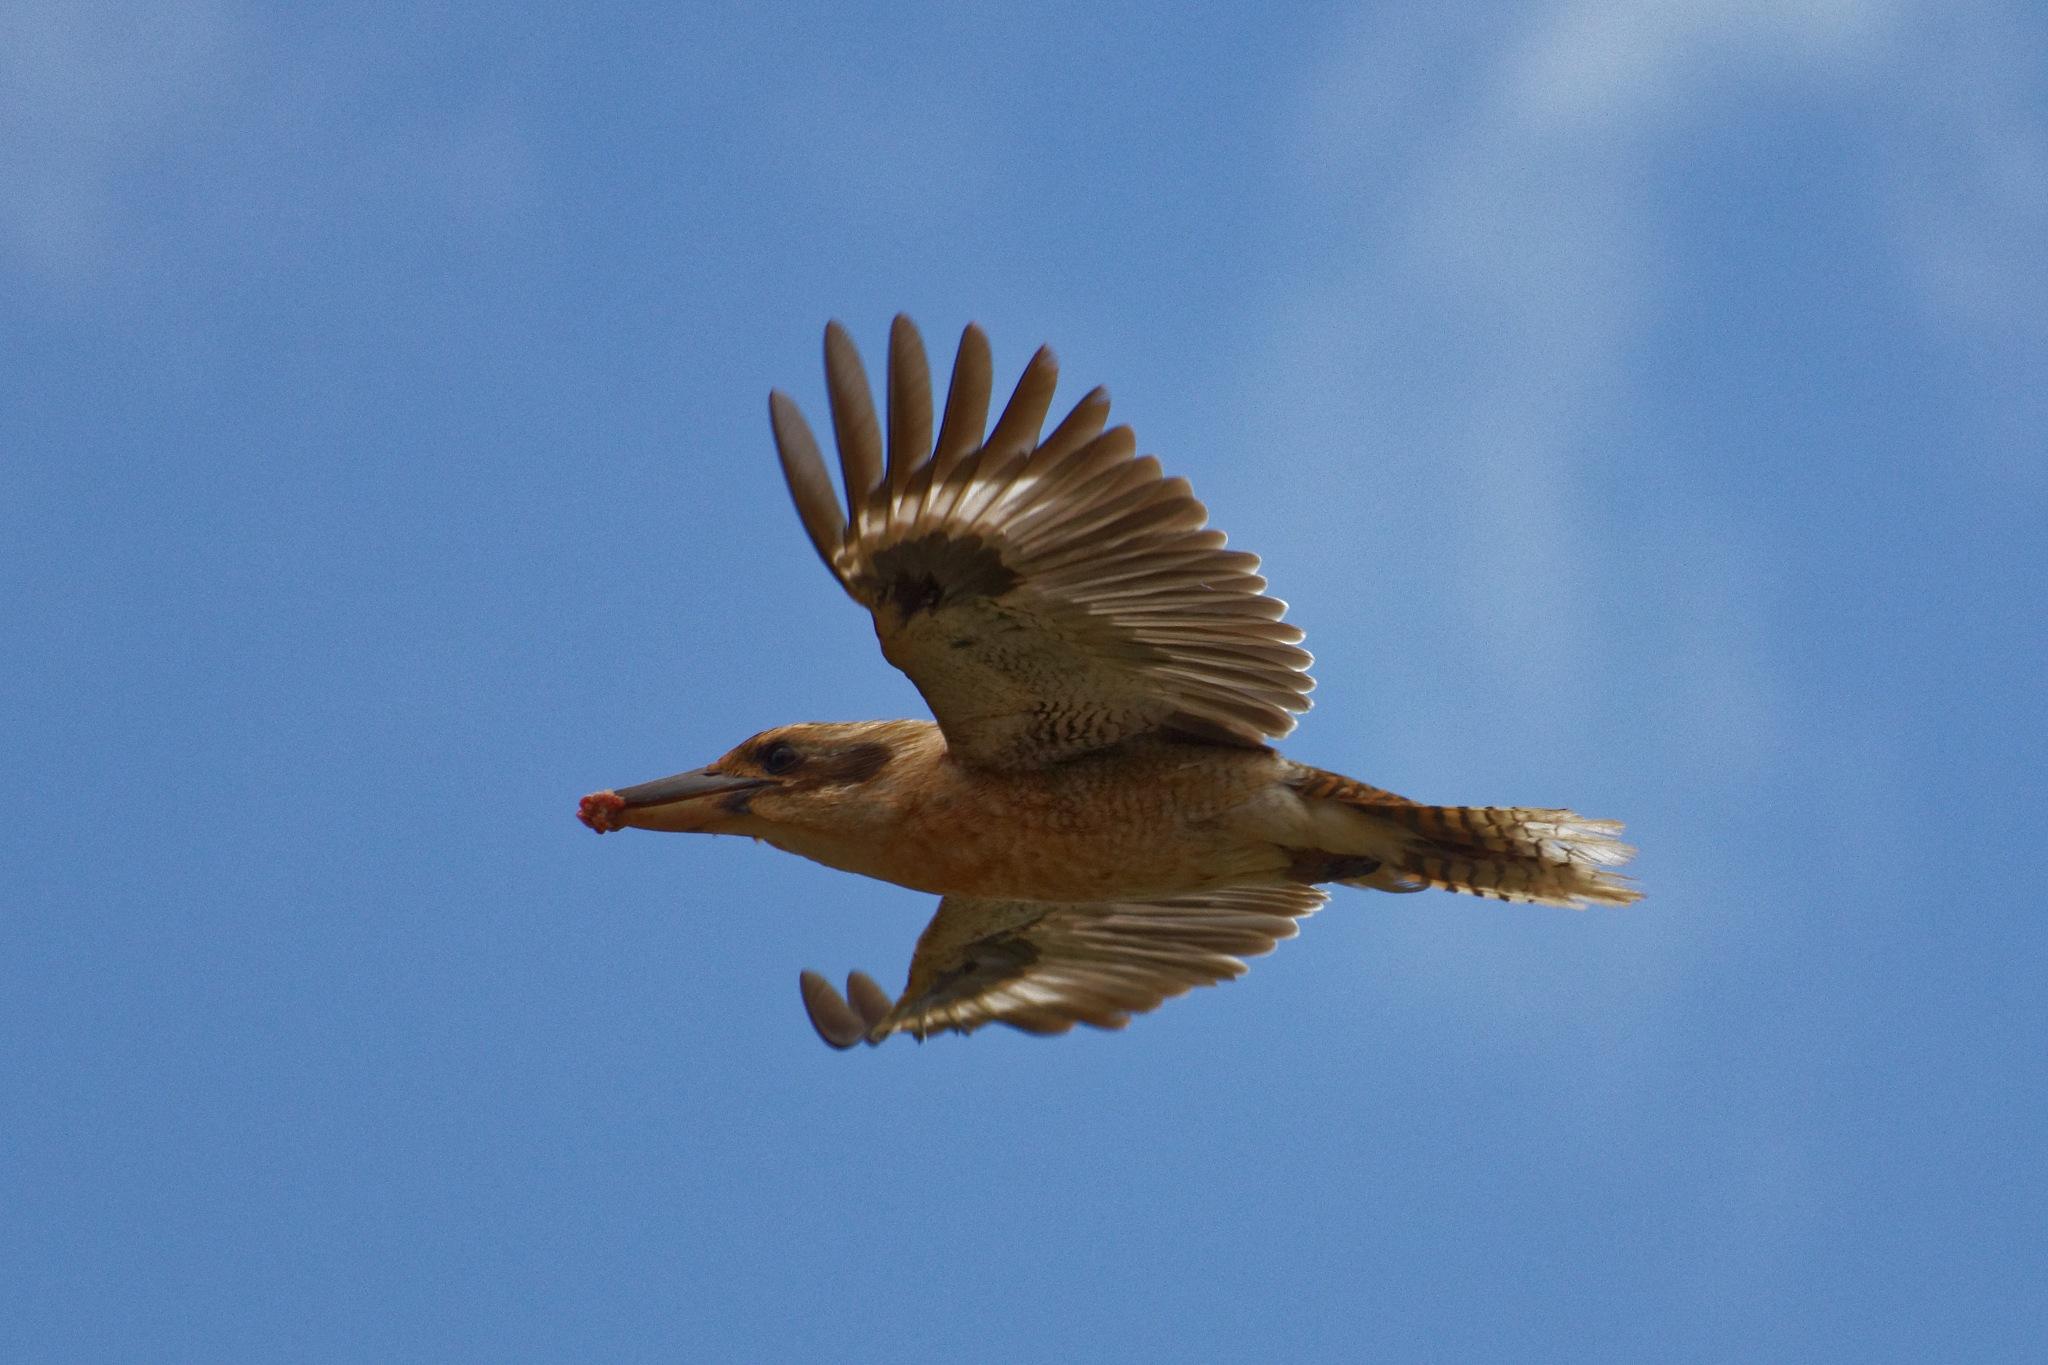 Kookaburra in flight by Yossarian1